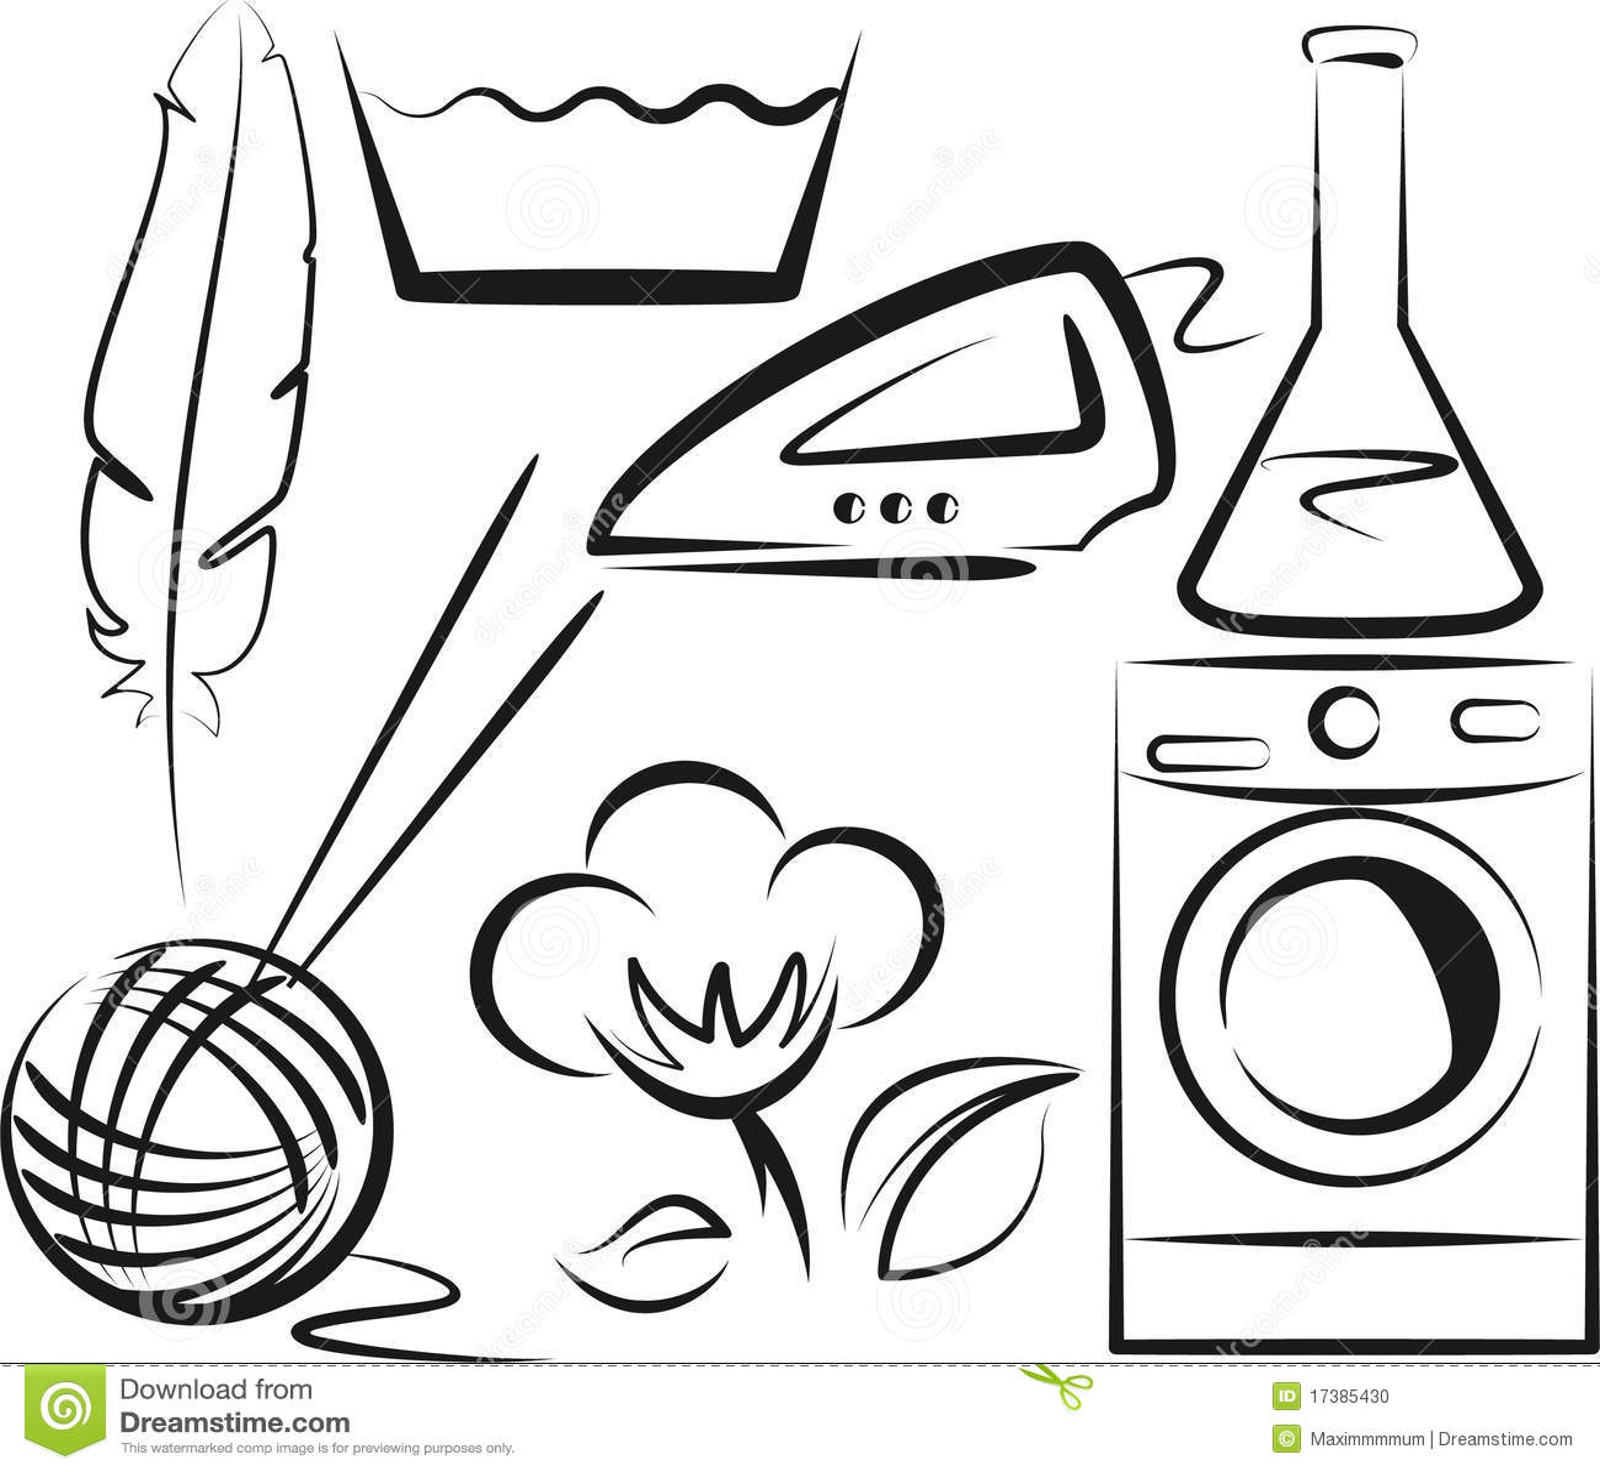 Washing symbols stock vector illustration of machine 17385430 washing symbols biocorpaavc Gallery